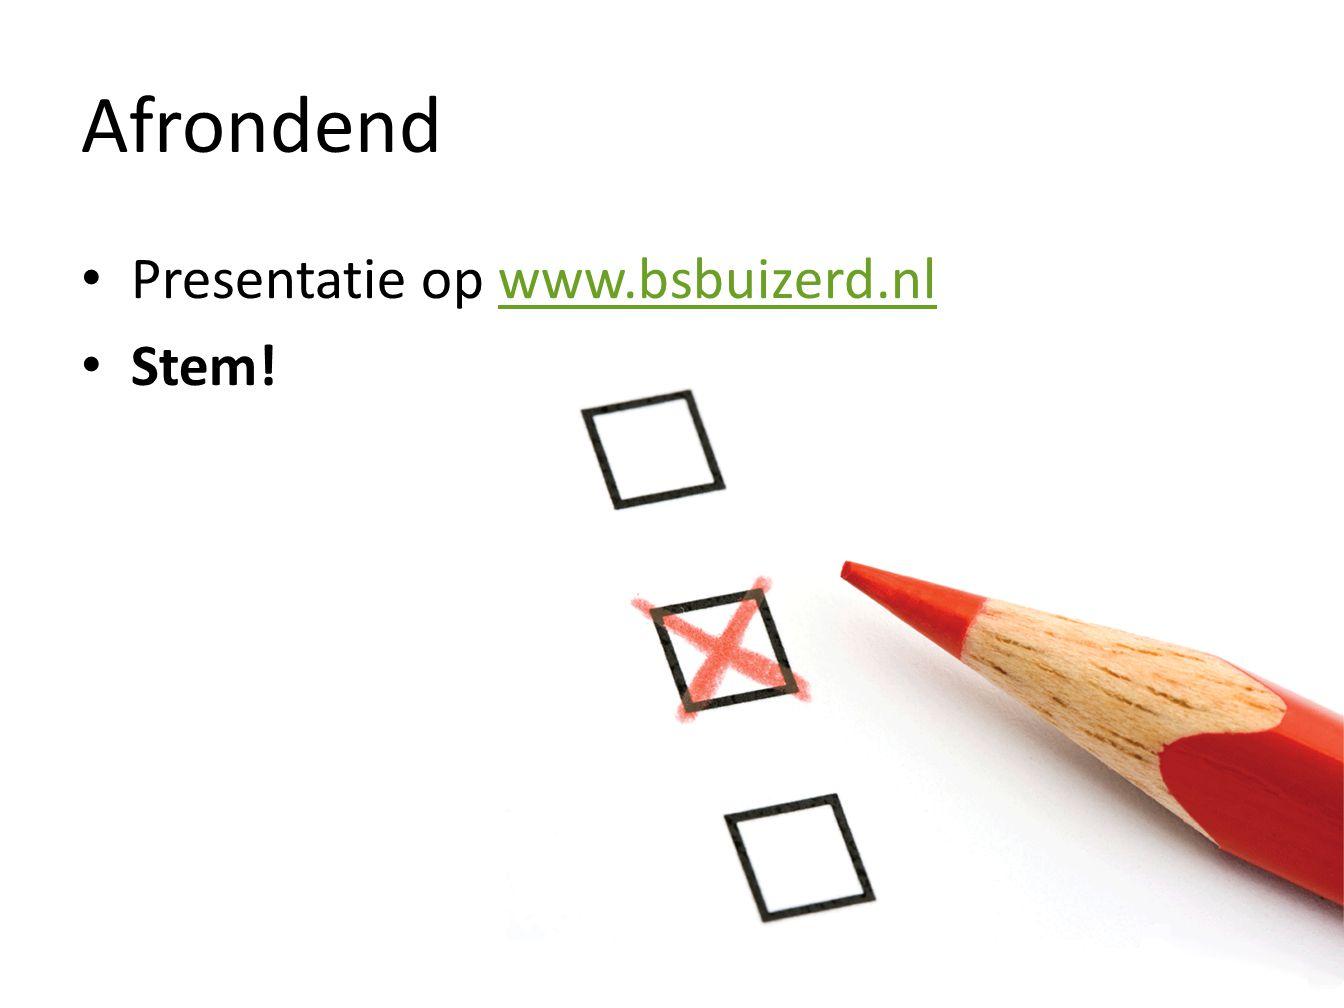 Afrondend Presentatie op www.bsbuizerd.nlwww.bsbuizerd.nl Stem!